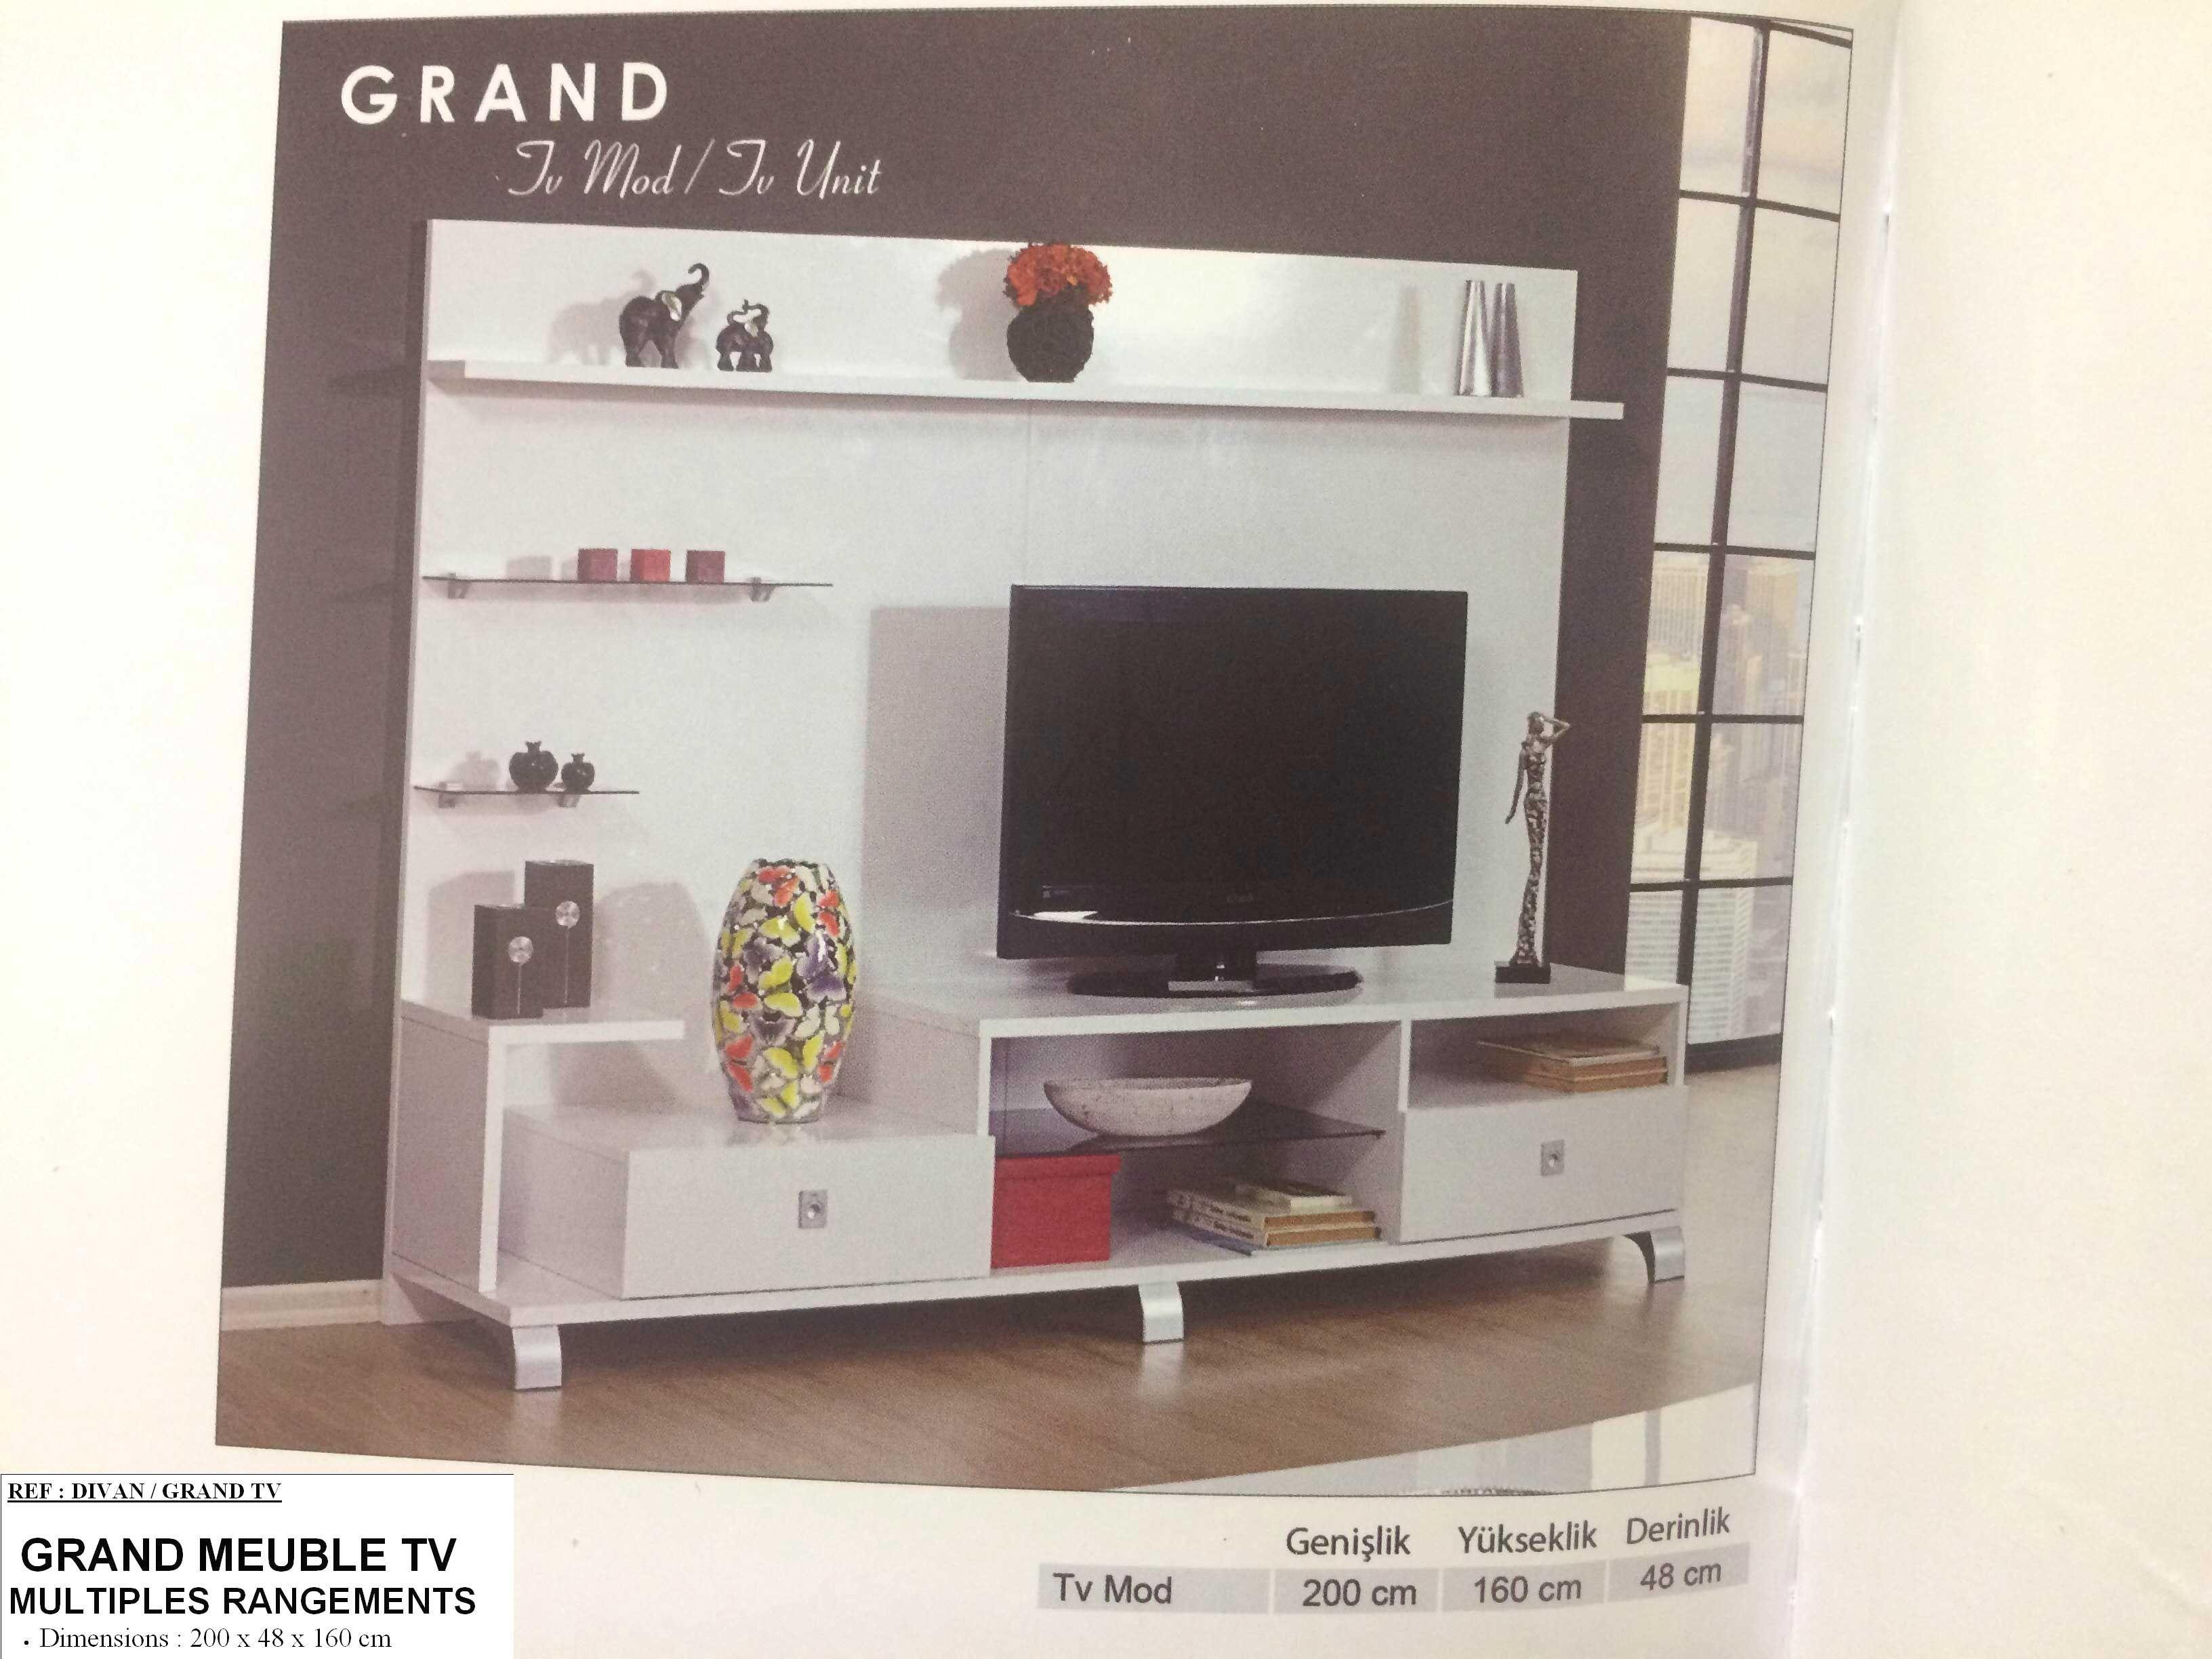 Meuble Tv Living Dekora Avec Divan Grand Tv Et Grand Meuble Tv